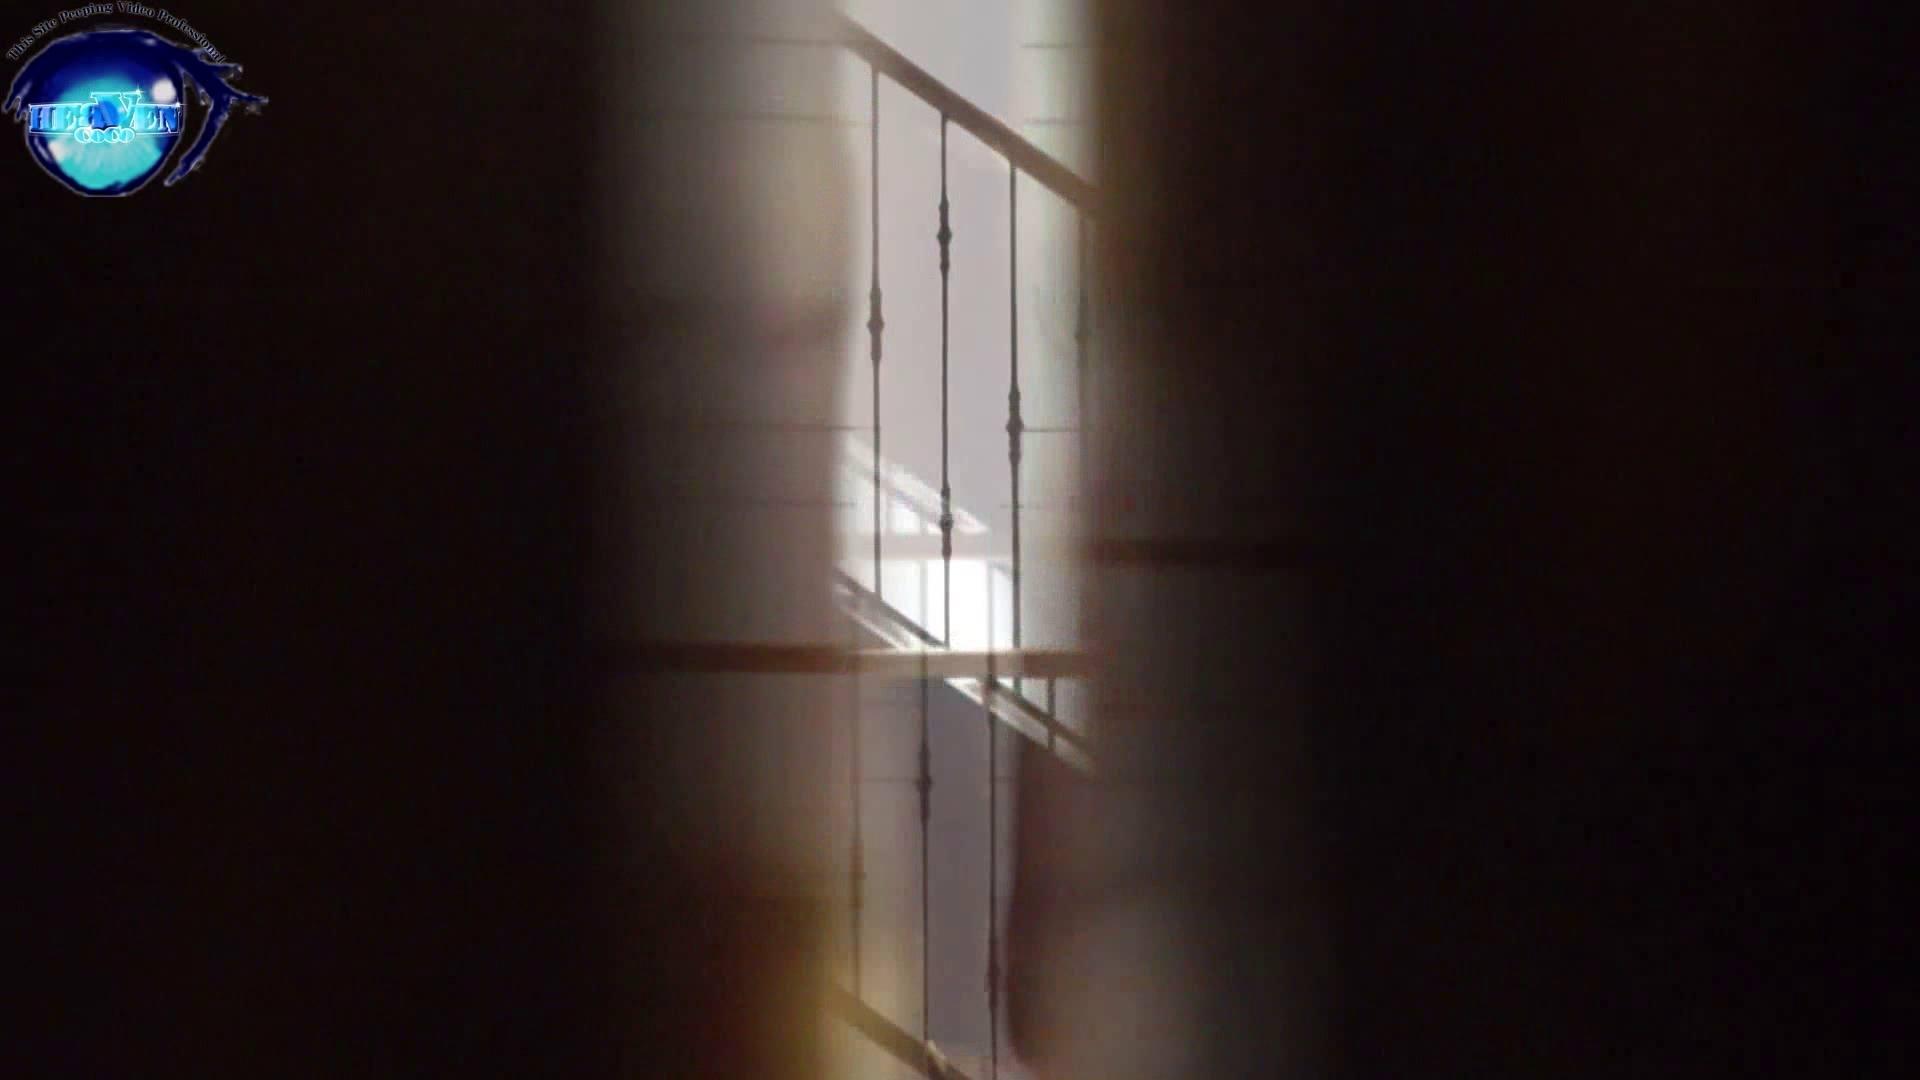 GOD HAND ファッションショッピングセンター盗撮vol.02前編 盗撮 ワレメ無修正動画無料 74連発 53